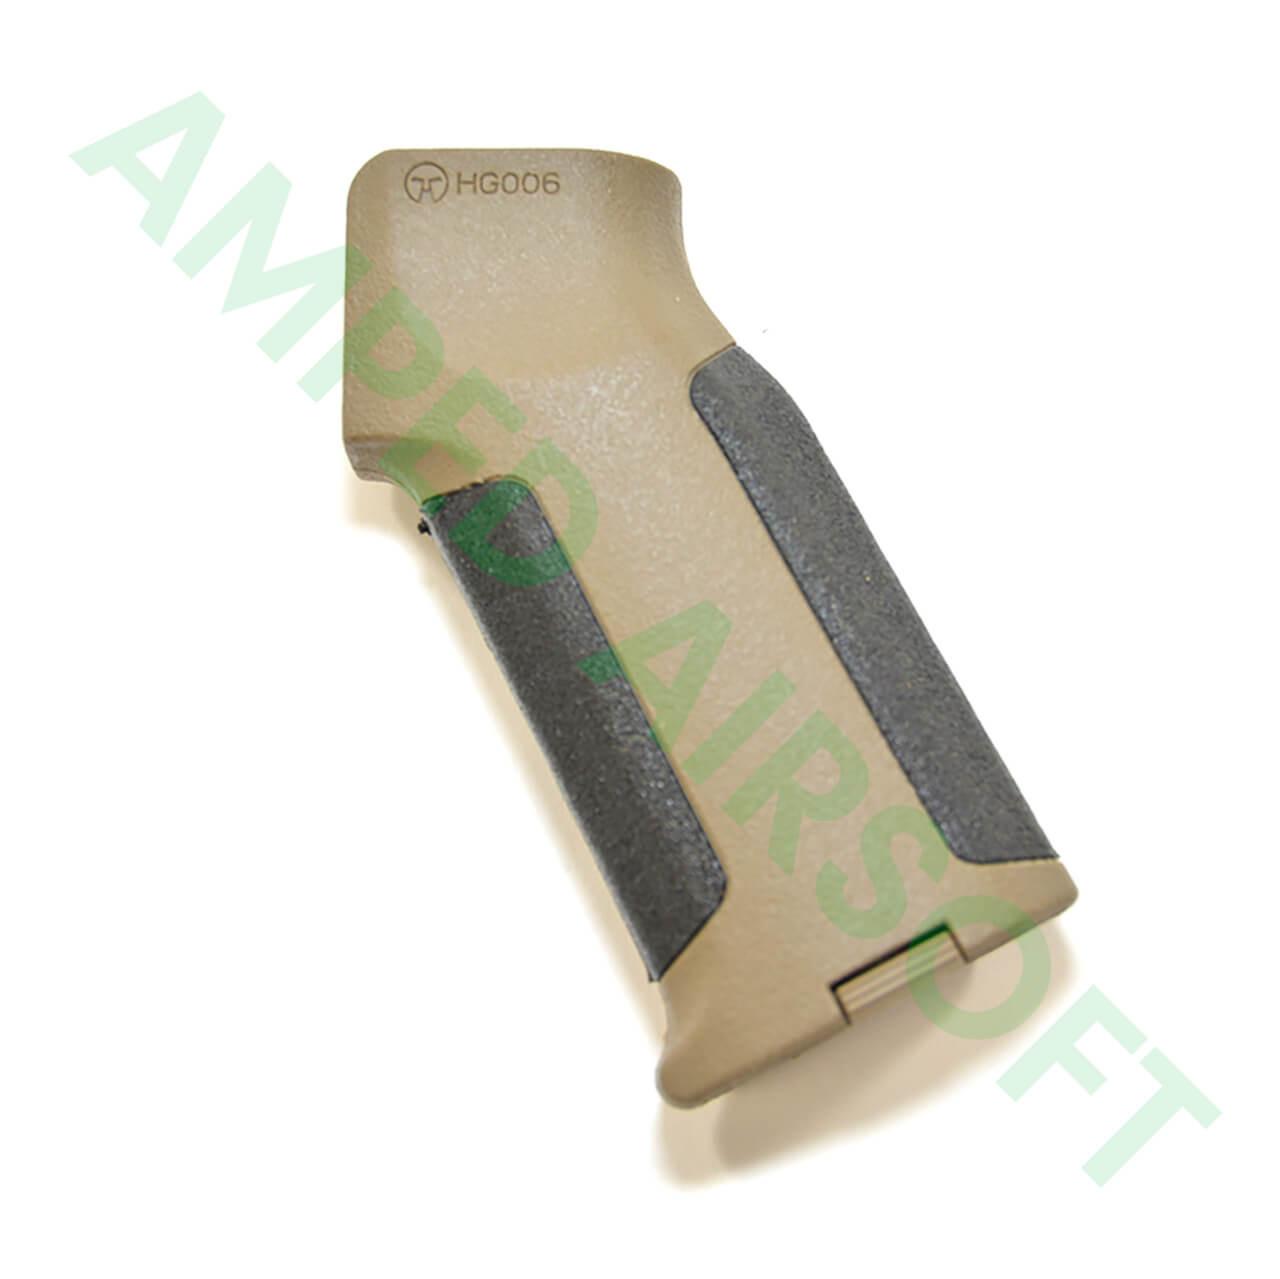 Amoeba - Pro Beavertail Straight Backstrap M4 Grip (Black/Dark Earth) Left Side